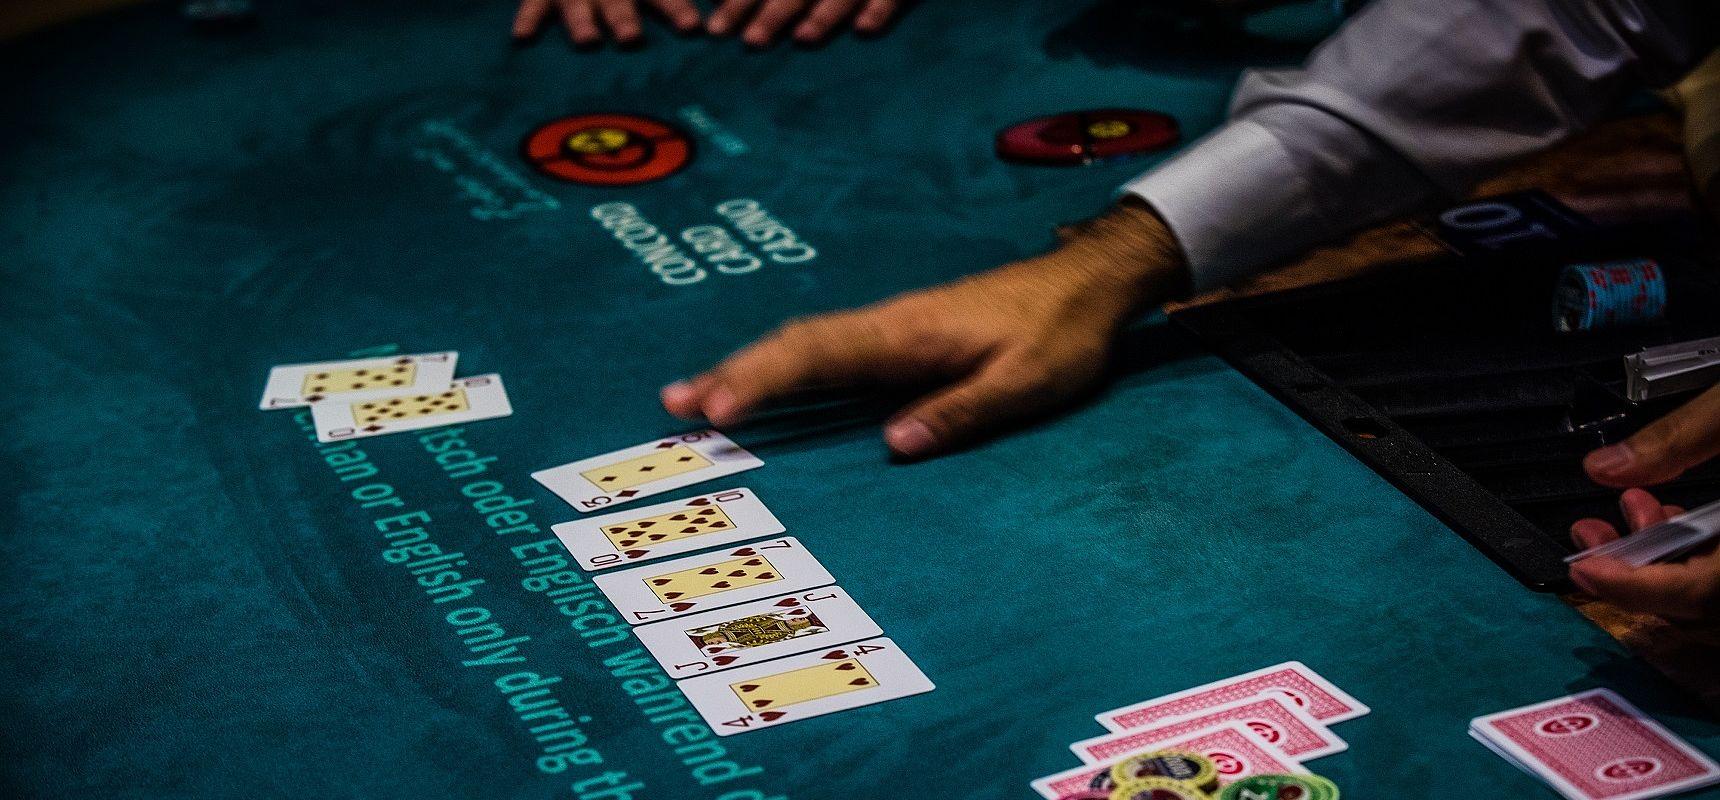 Card casino bregenz hotel